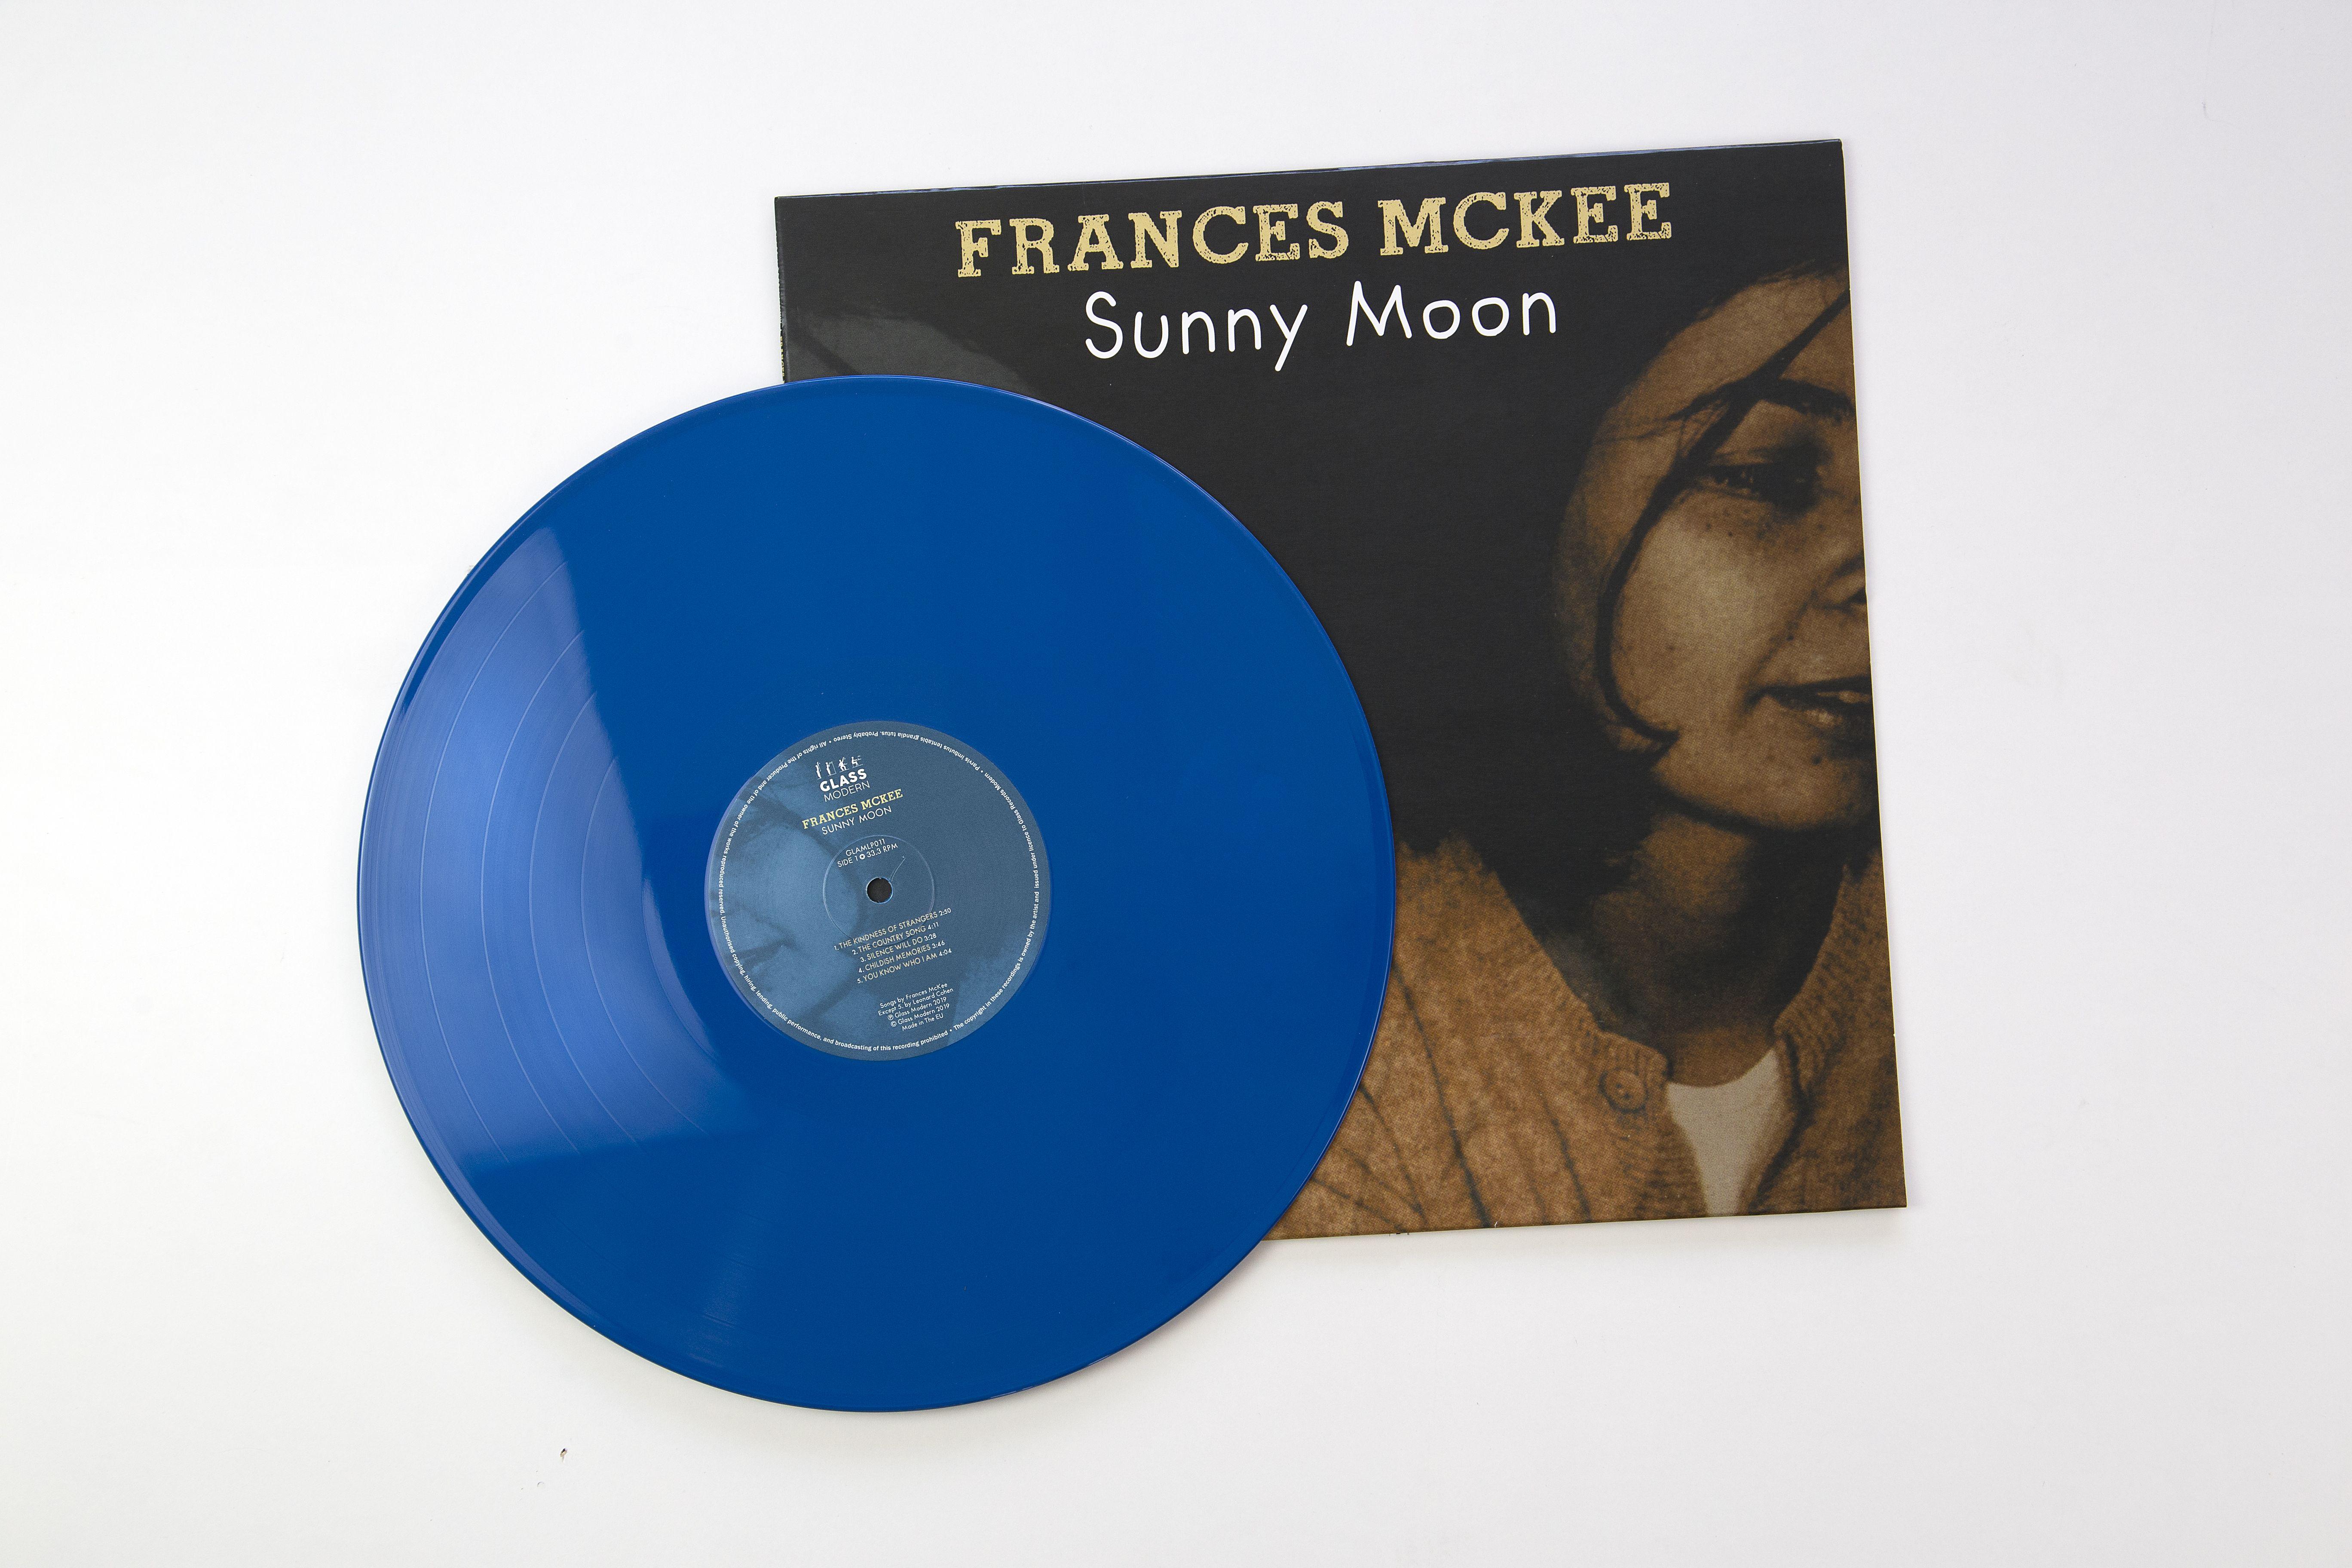 An Exclusive Sea Blue Coloured Vinyl First Time On Vinyl From The Vaselines Singer Songwriter Vinyl Hidden Art Mckee